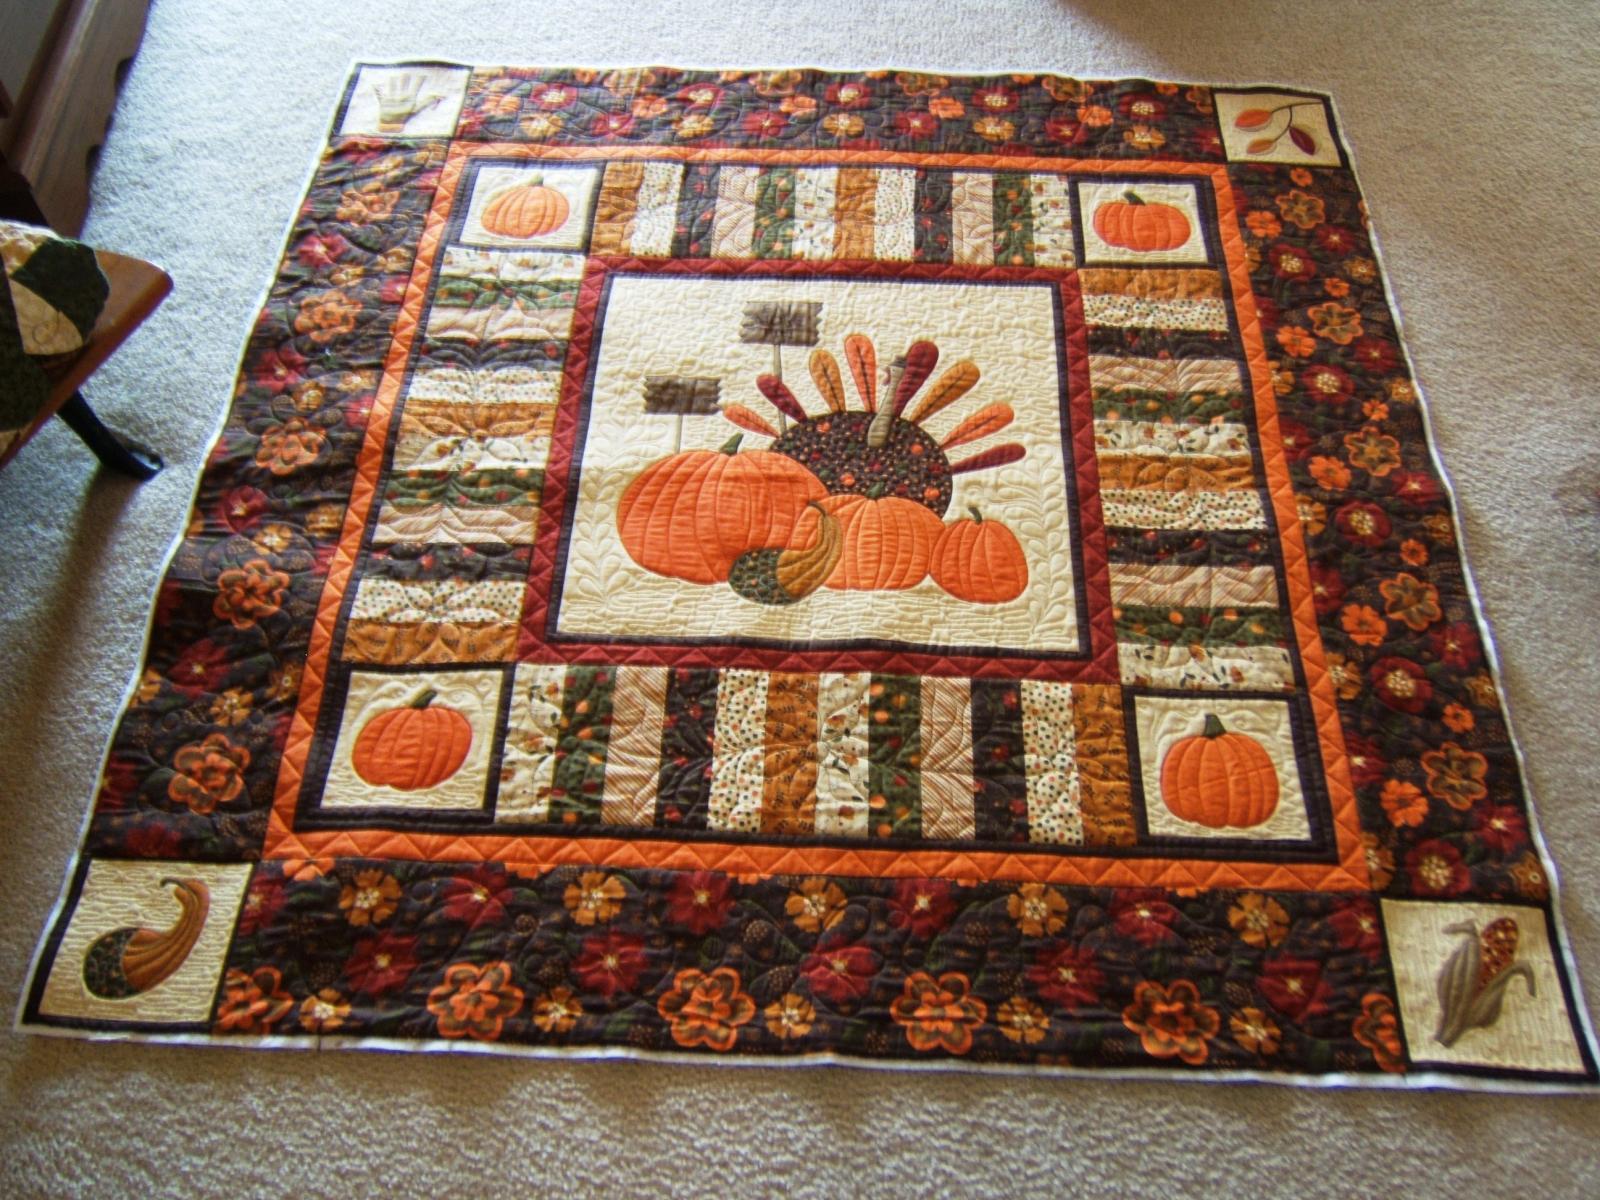 cheryls+thanksgiving+quilt+001.jpg